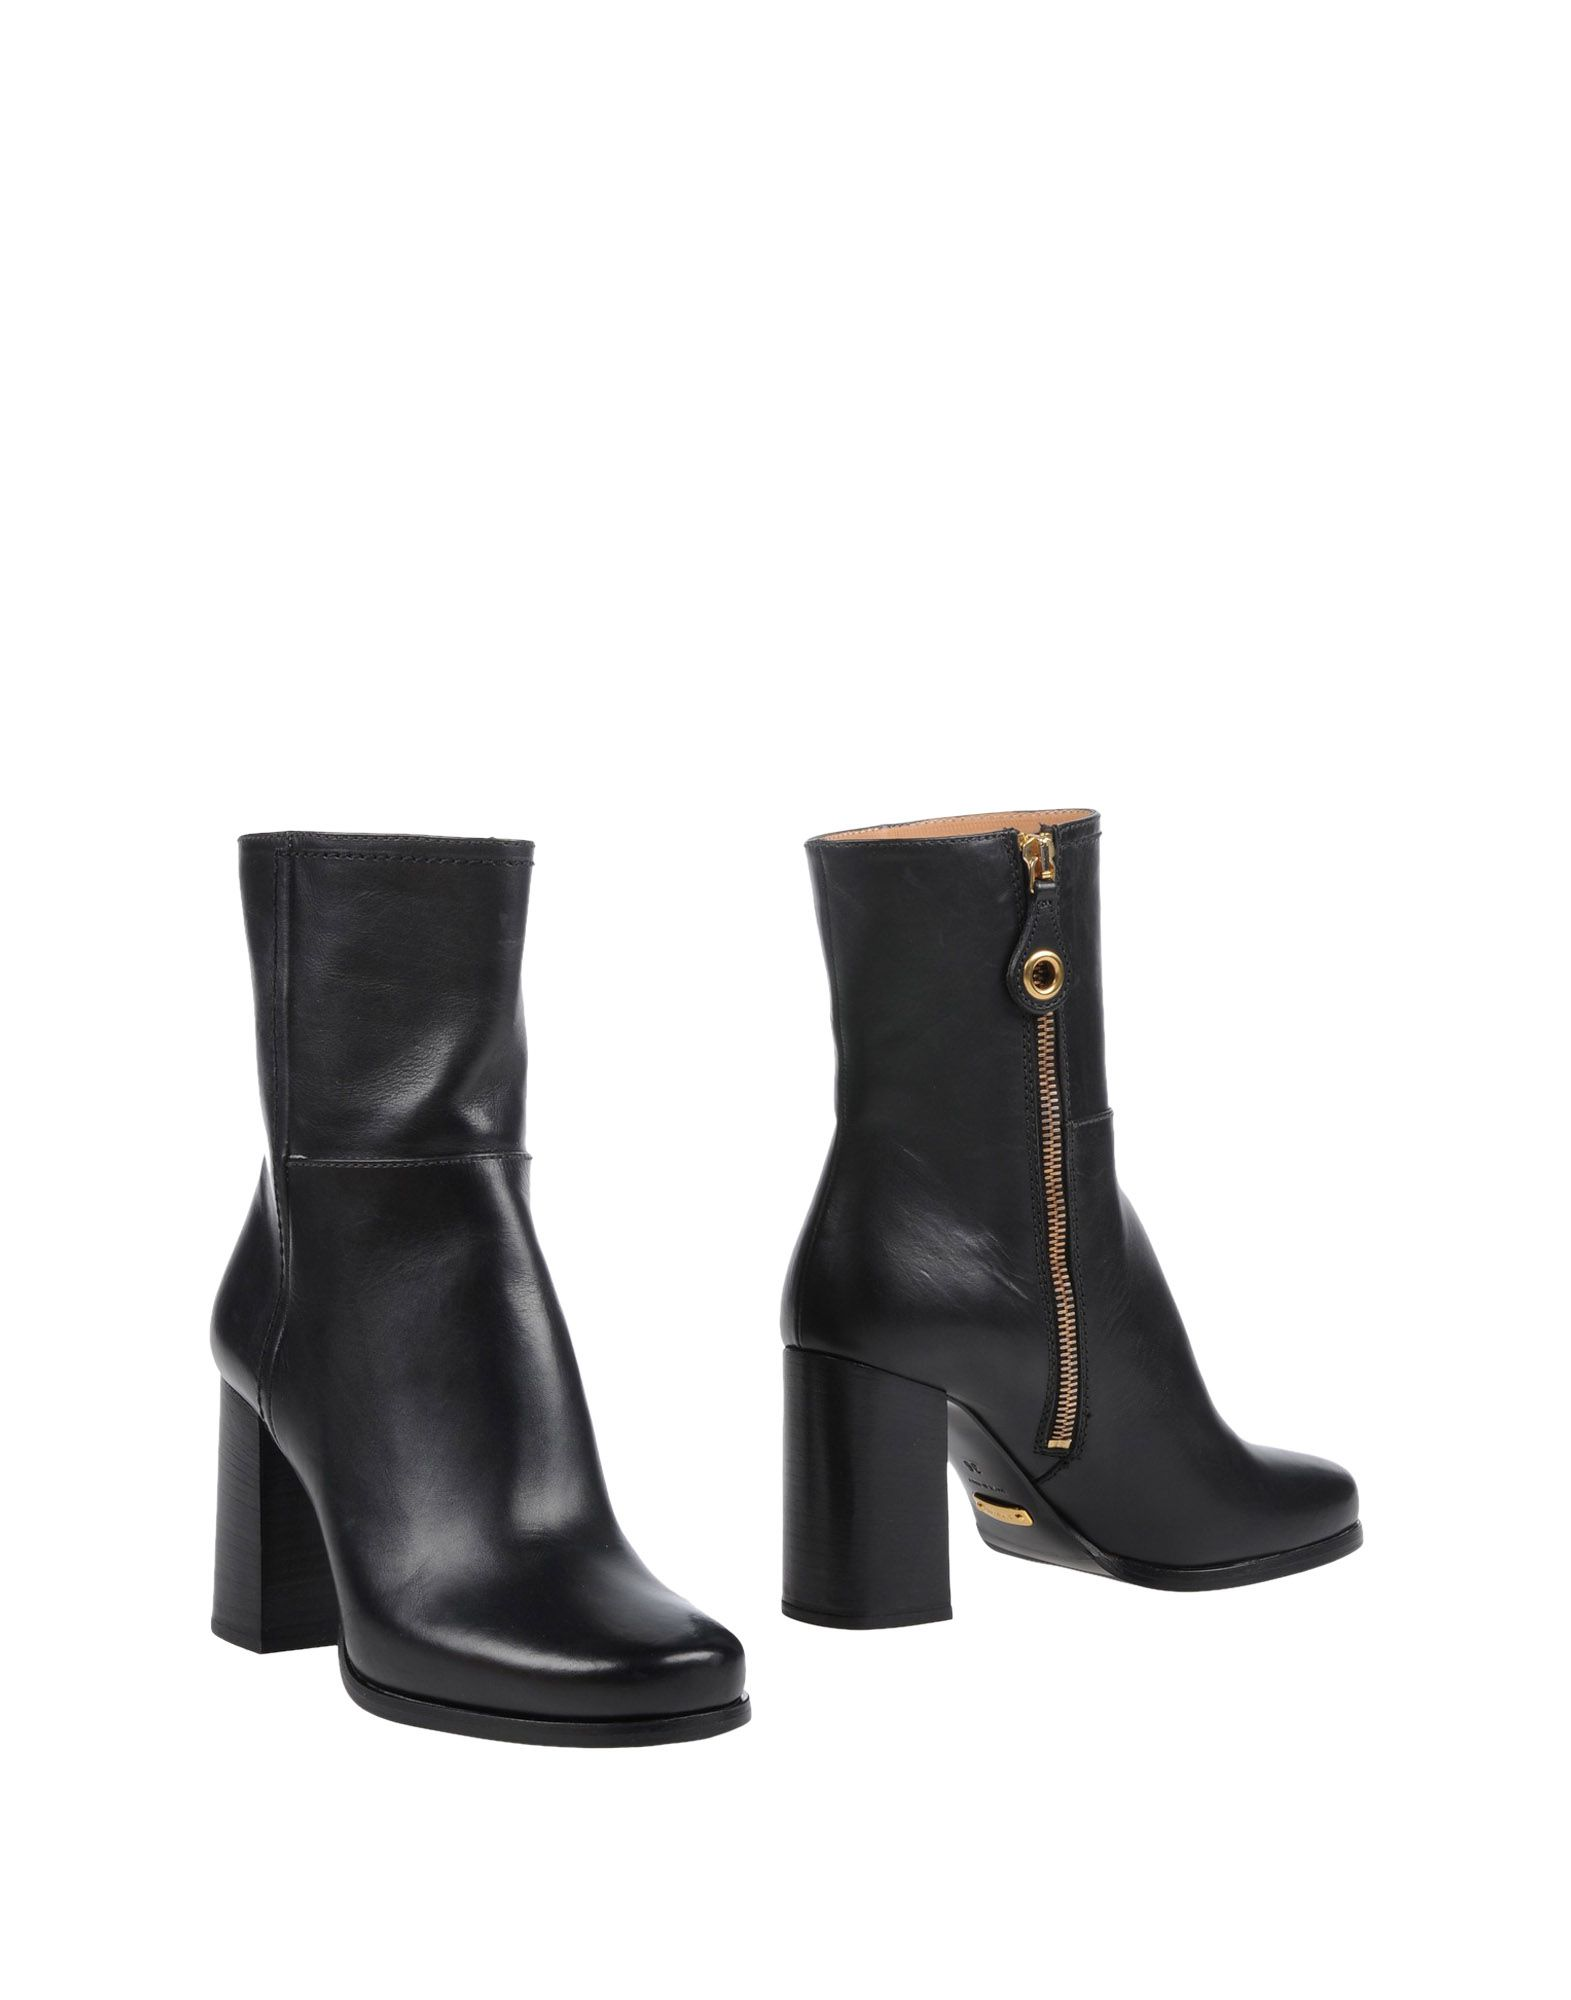 Stilvolle billige Schuhe Carshoe Stiefelette Stiefelette Stiefelette Damen  11442545NM 427b91